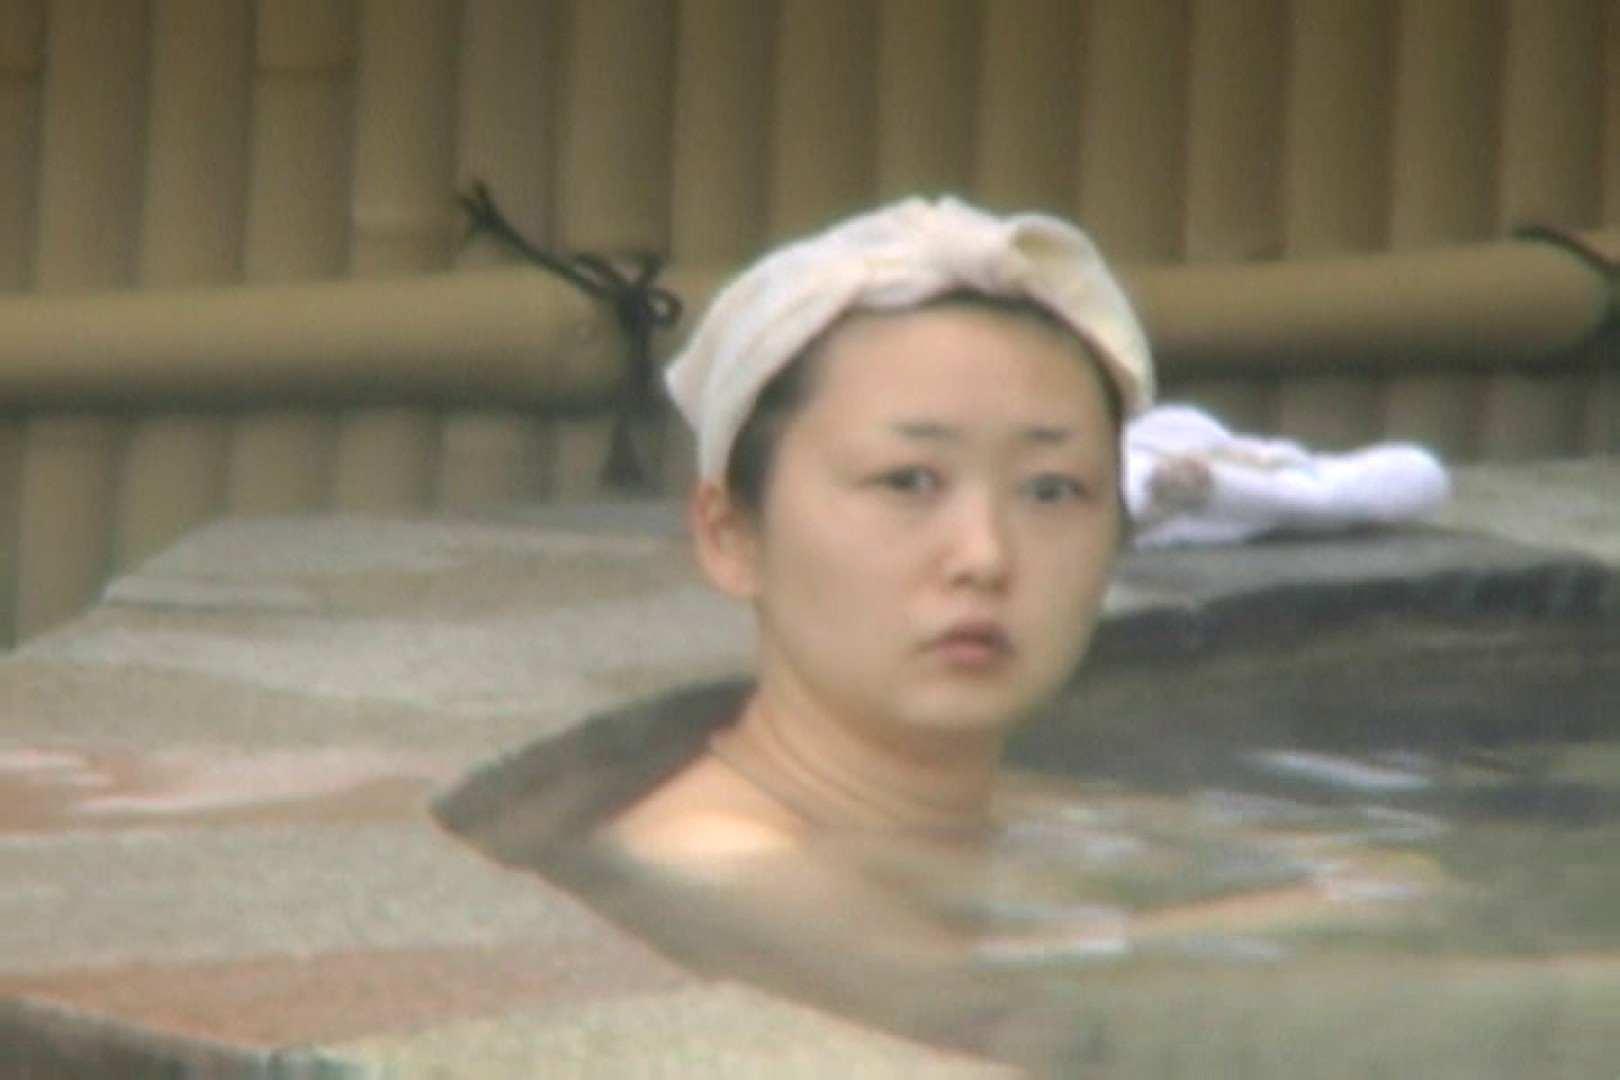 Aquaな露天風呂Vol.564 OL  87連発 35